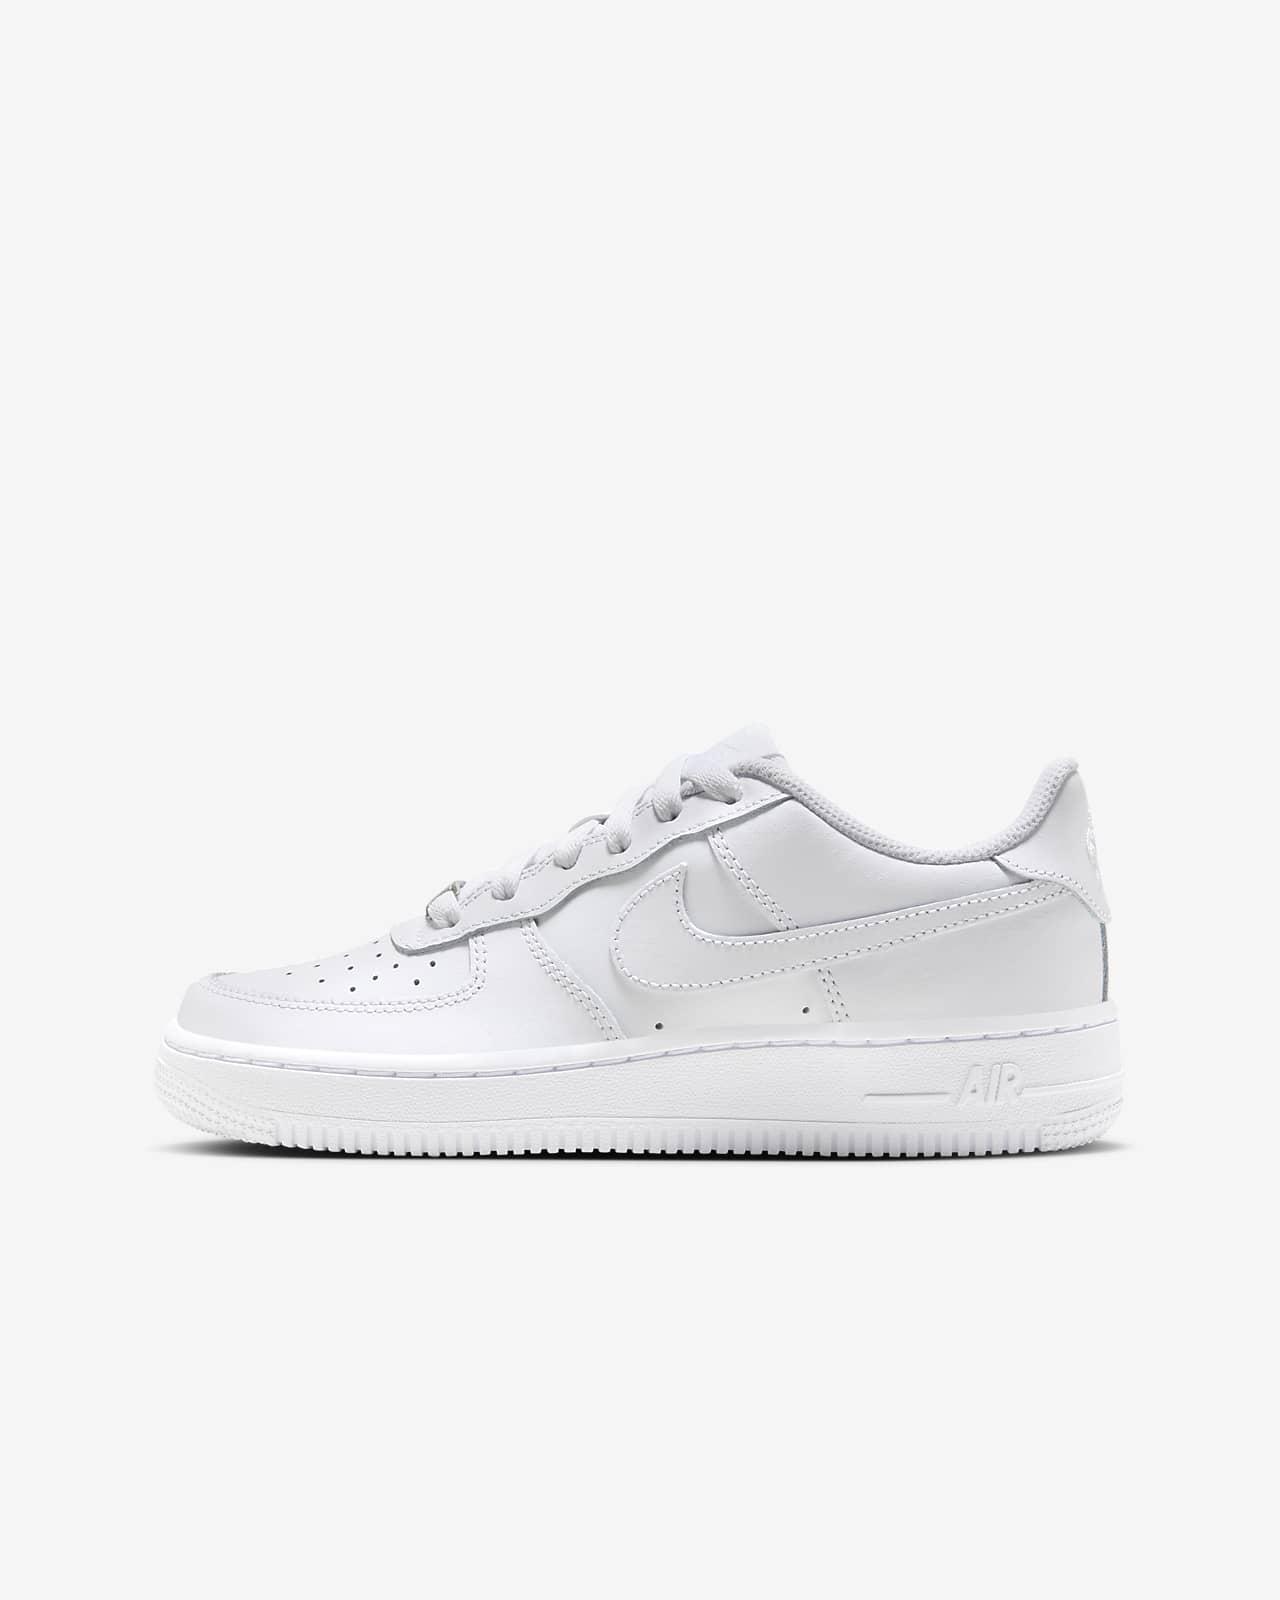 Nike Air Force 1 LE Schuh für ältere Kinder